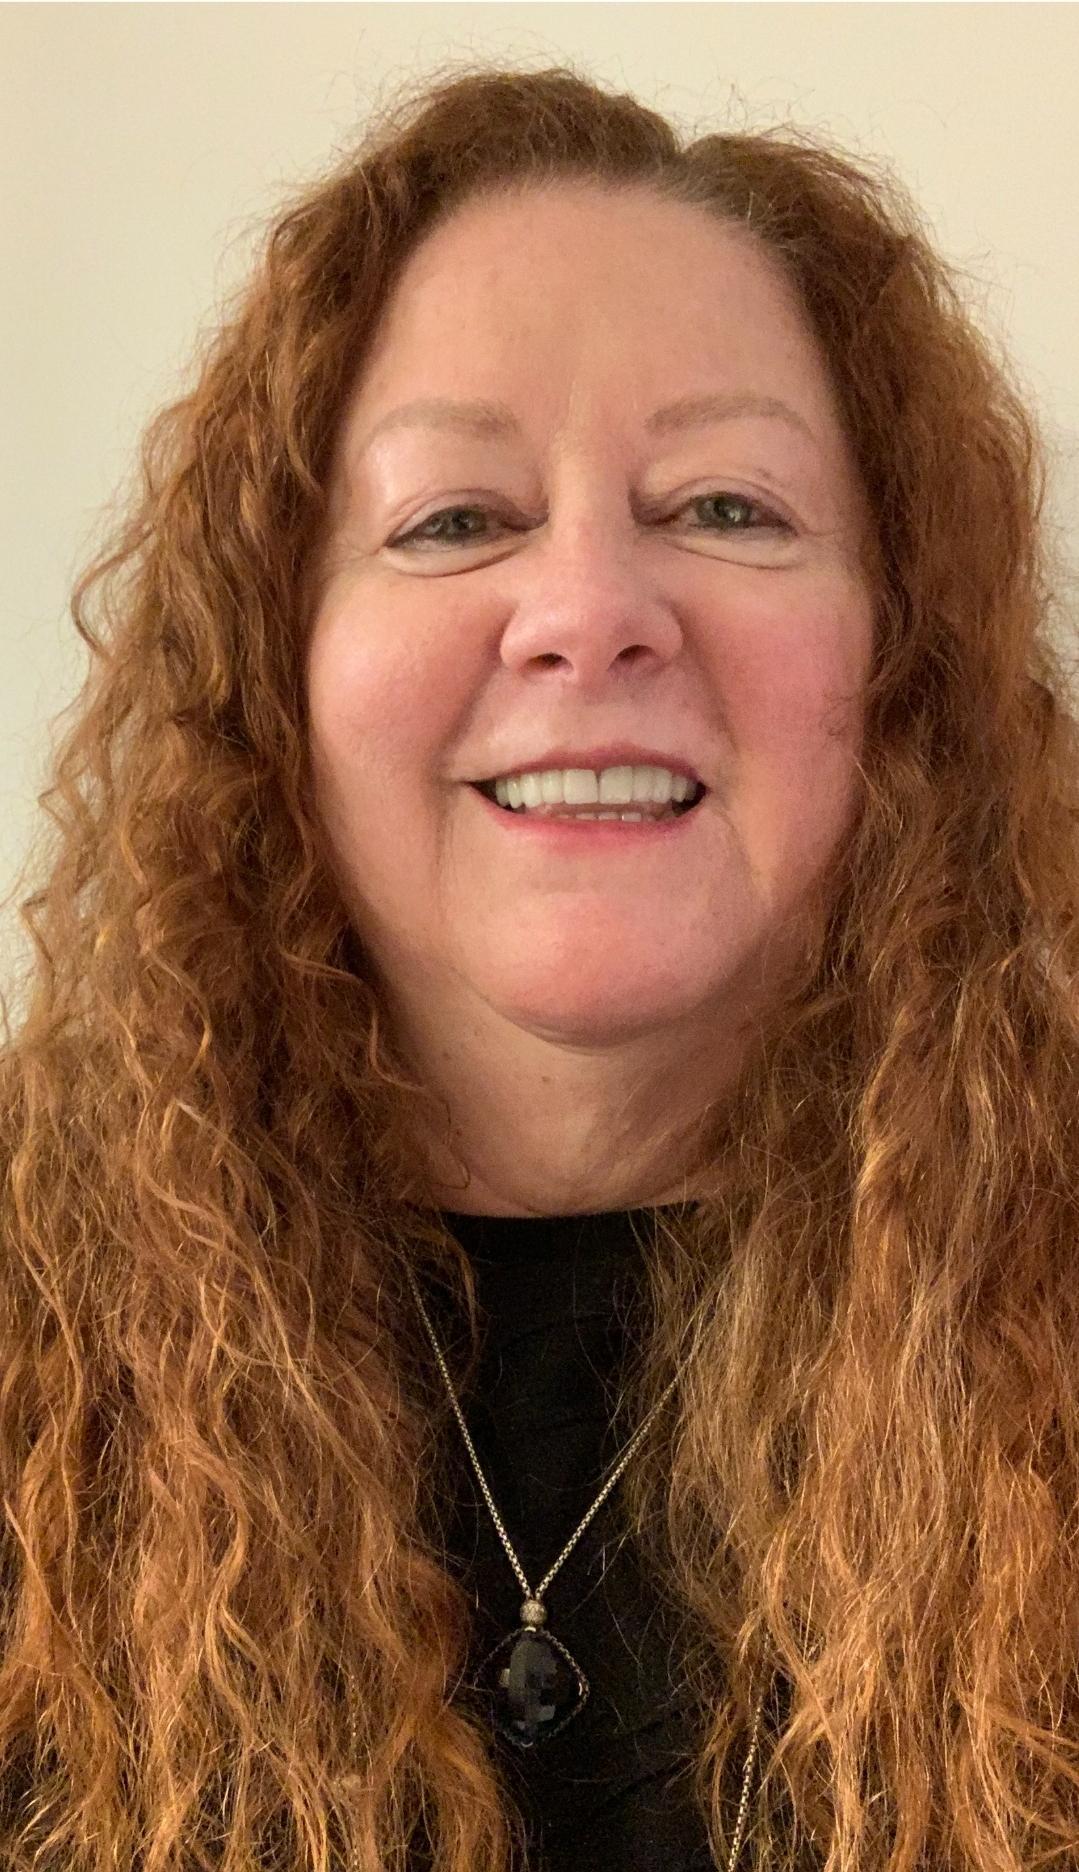 Furry Friends Spotlight on Debbie Baughman